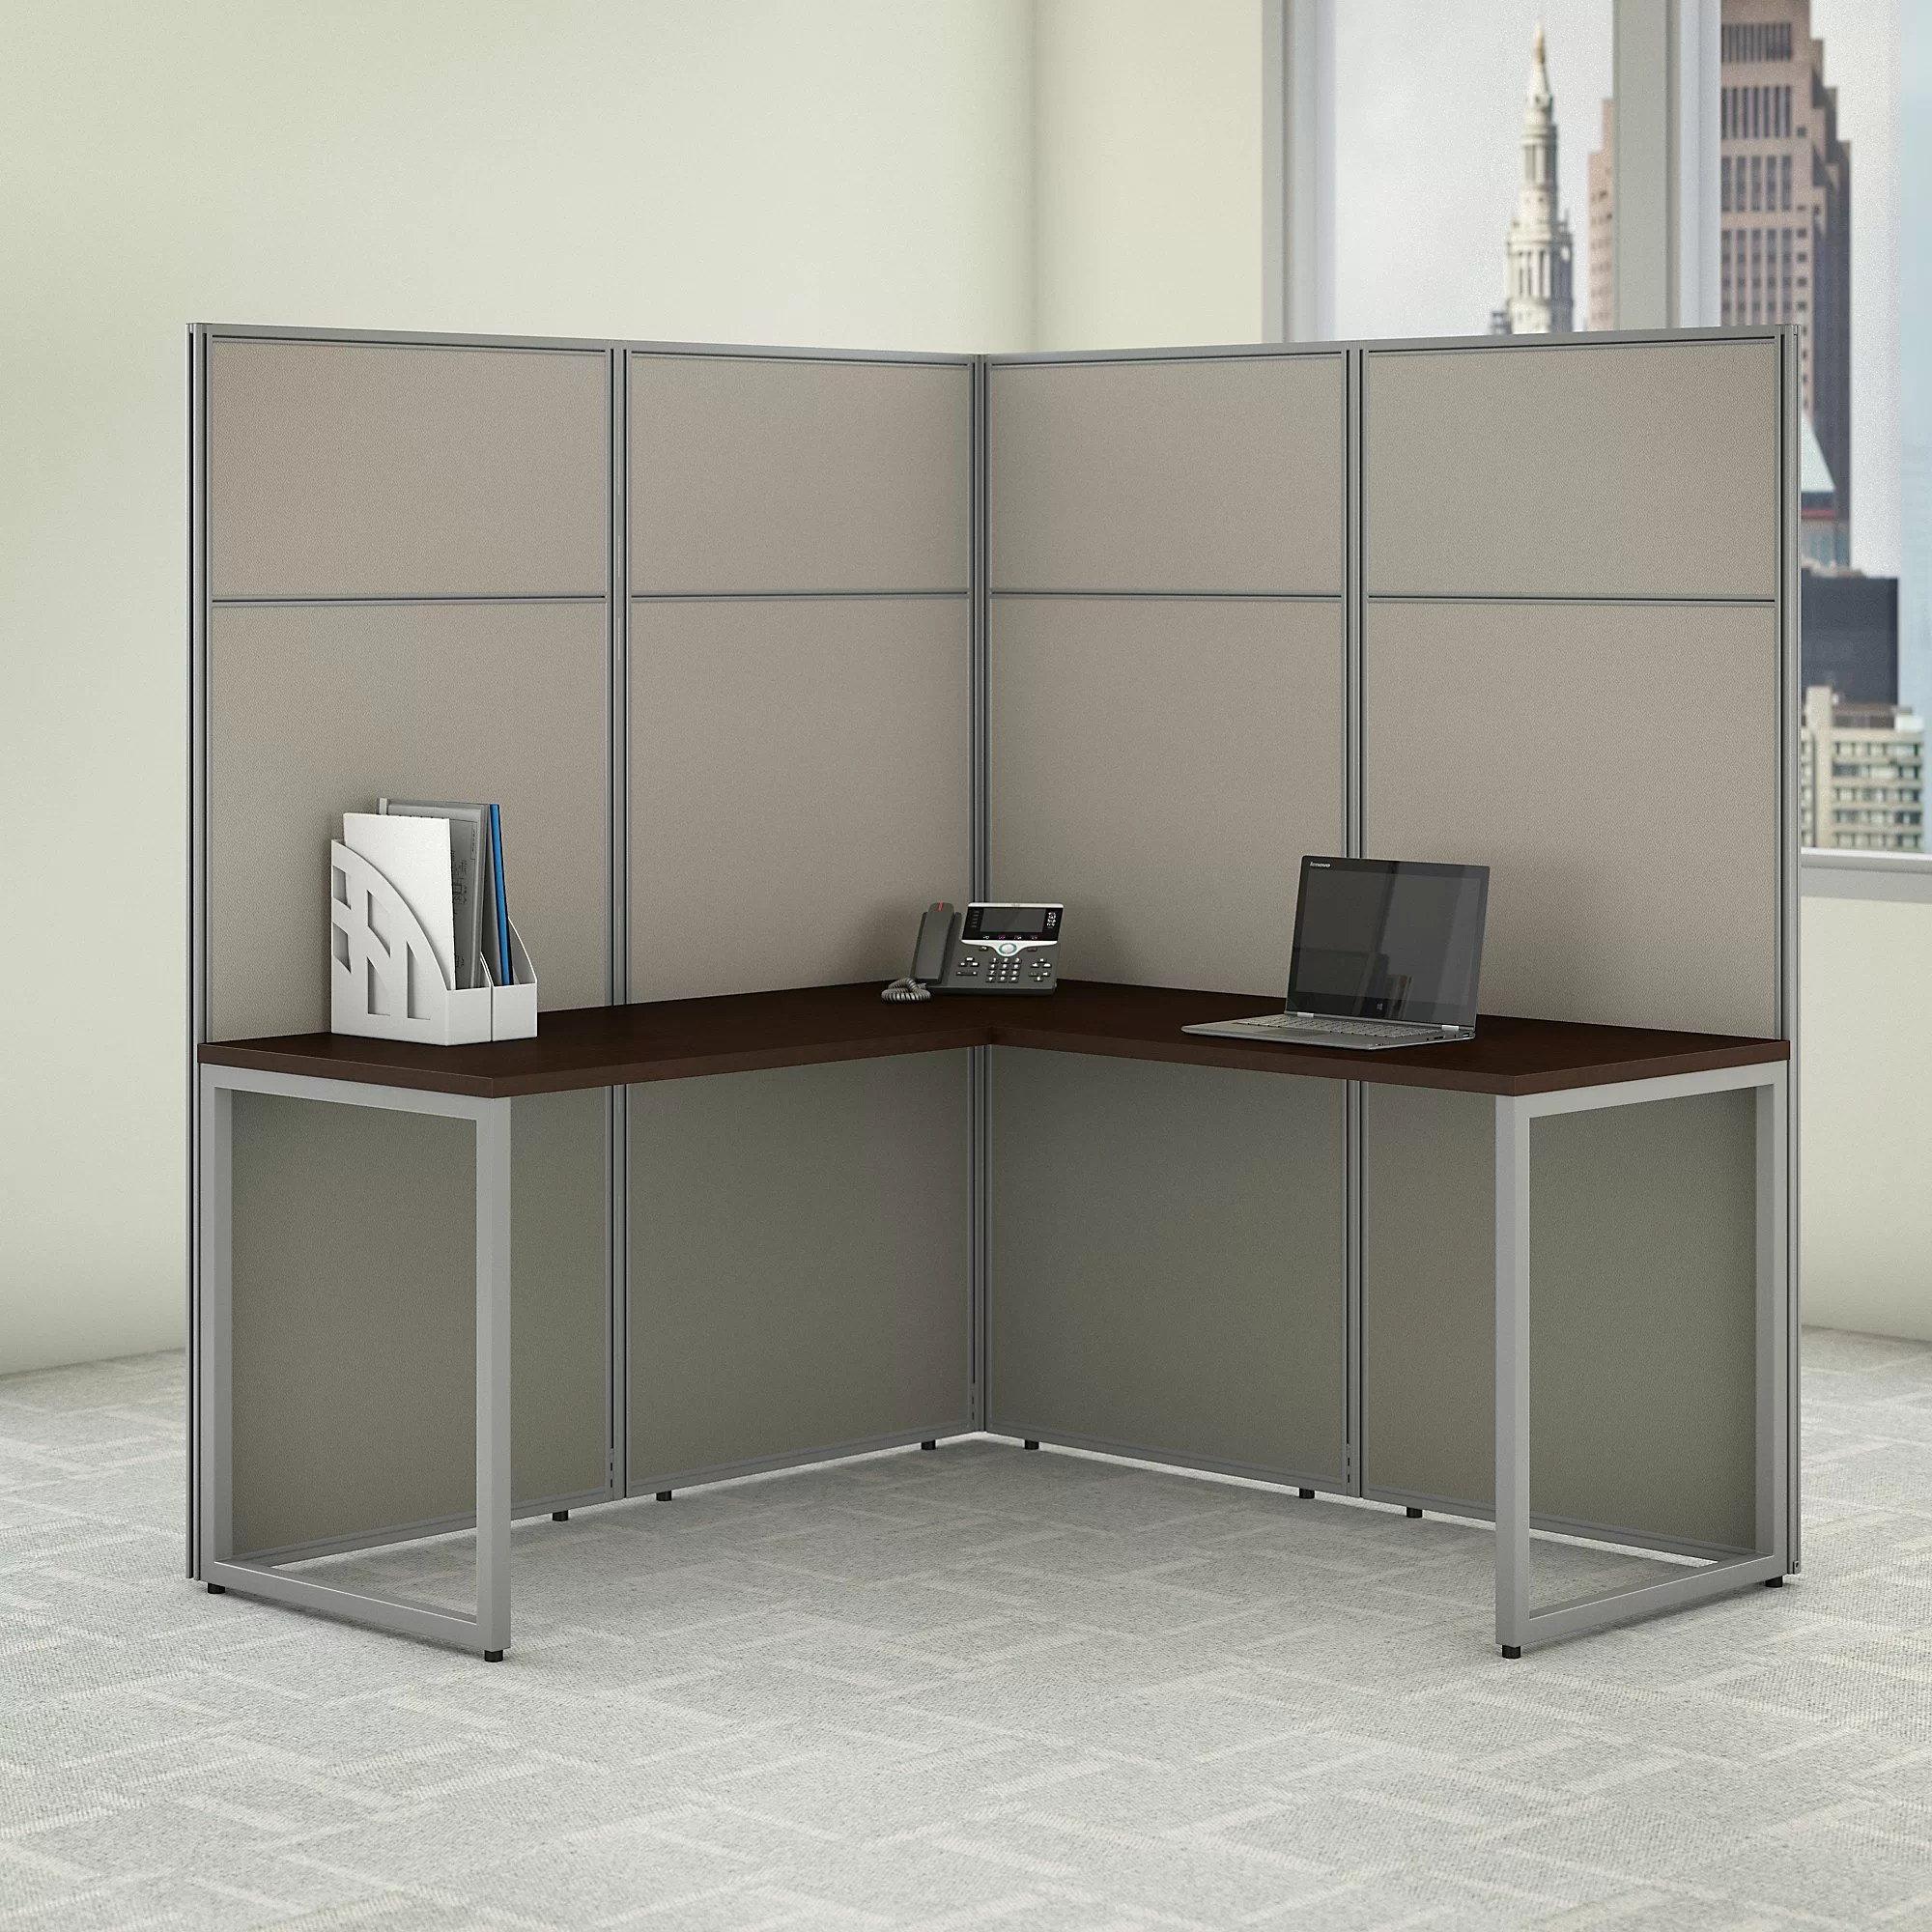 Bush Business Furniture Easy Office L Shaped Desk Workstation With Panels Cubicle Wayfair